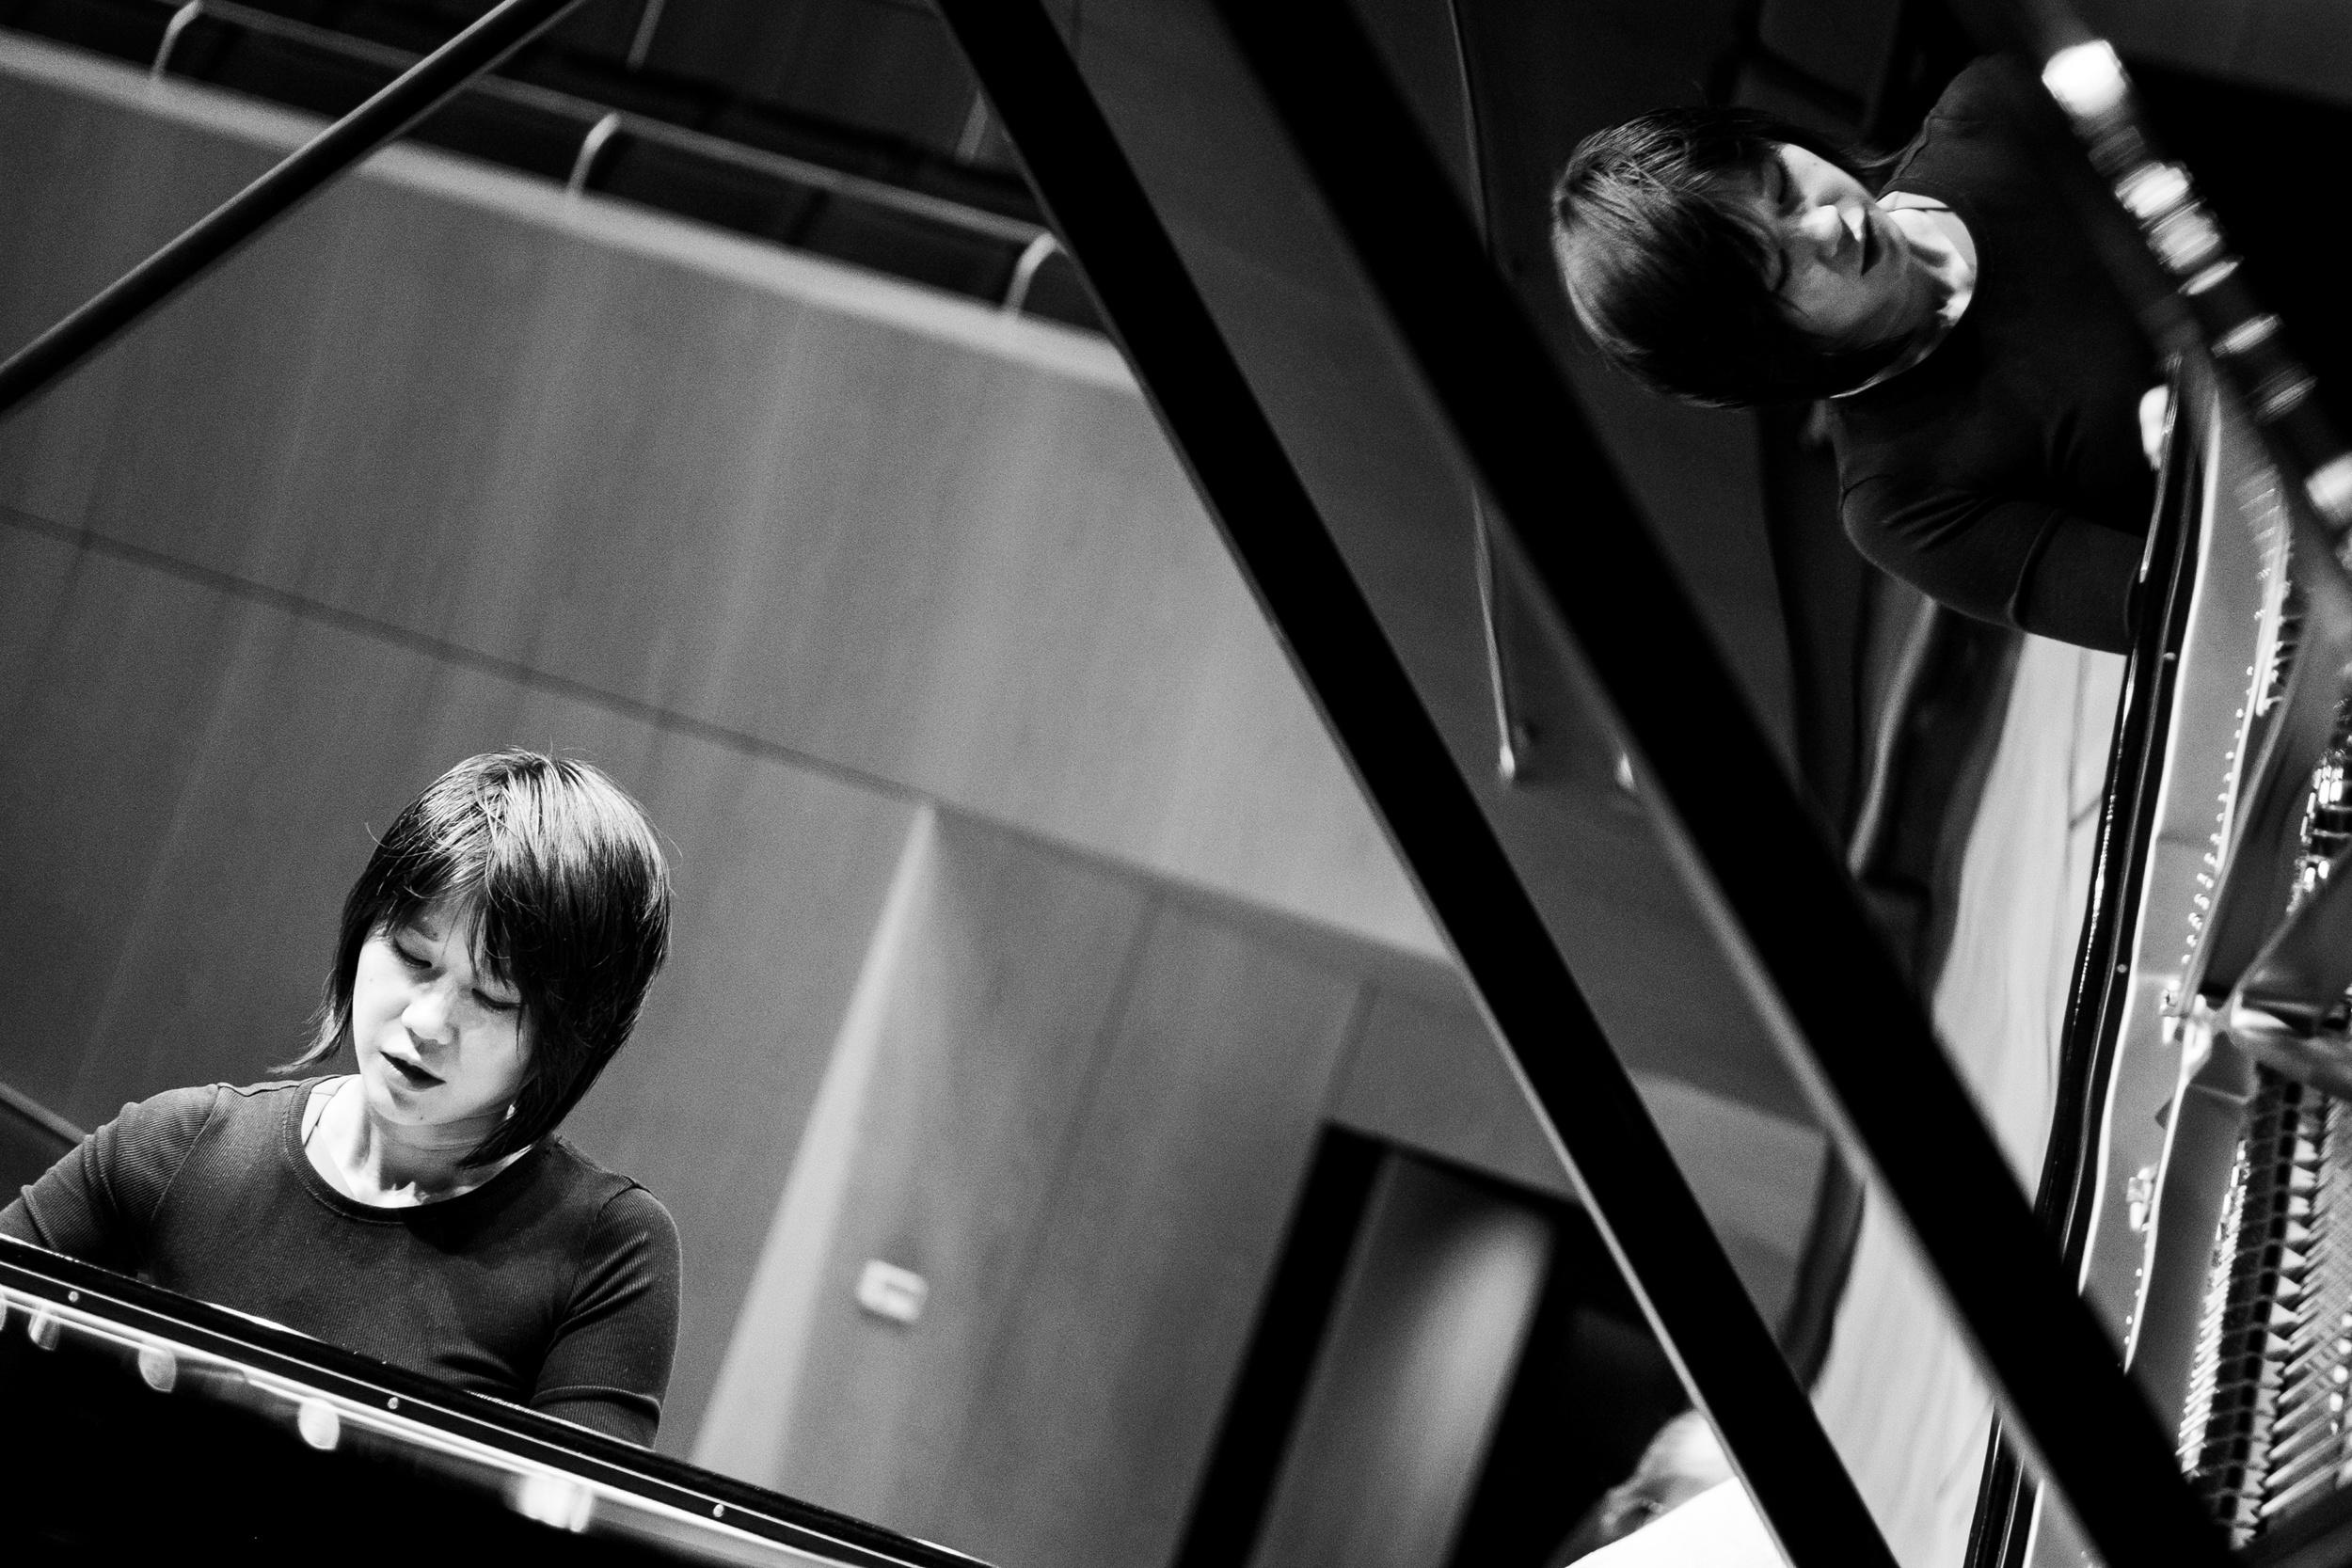 Mendelssohn - Canções sem Palavras, Op. 67 nº 2 Yuja Wang